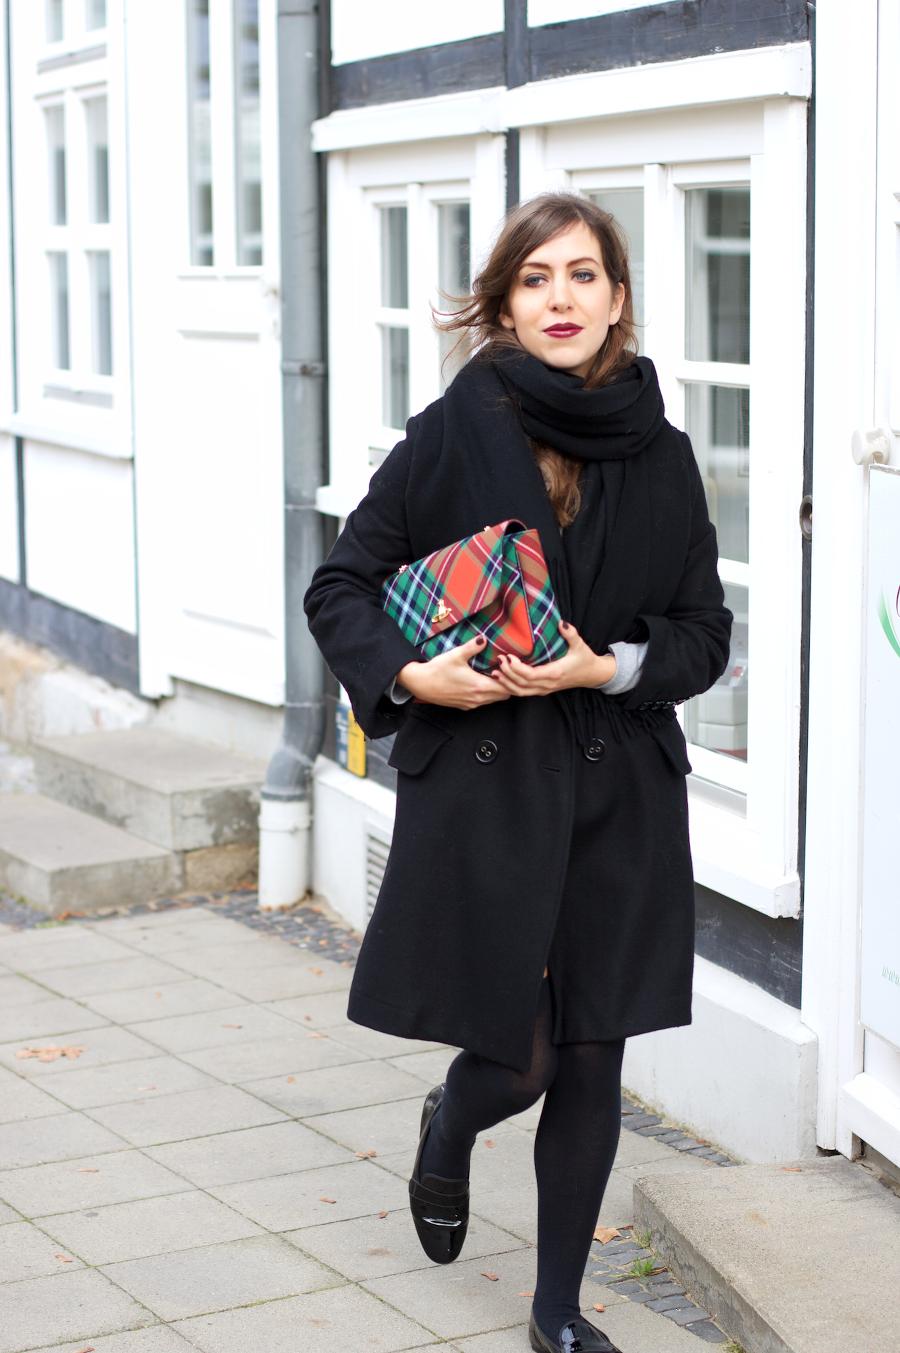 huge selection of 10f12 6700e Personal Style: Black Coat Vivienne Westwood Tartan Bag ...